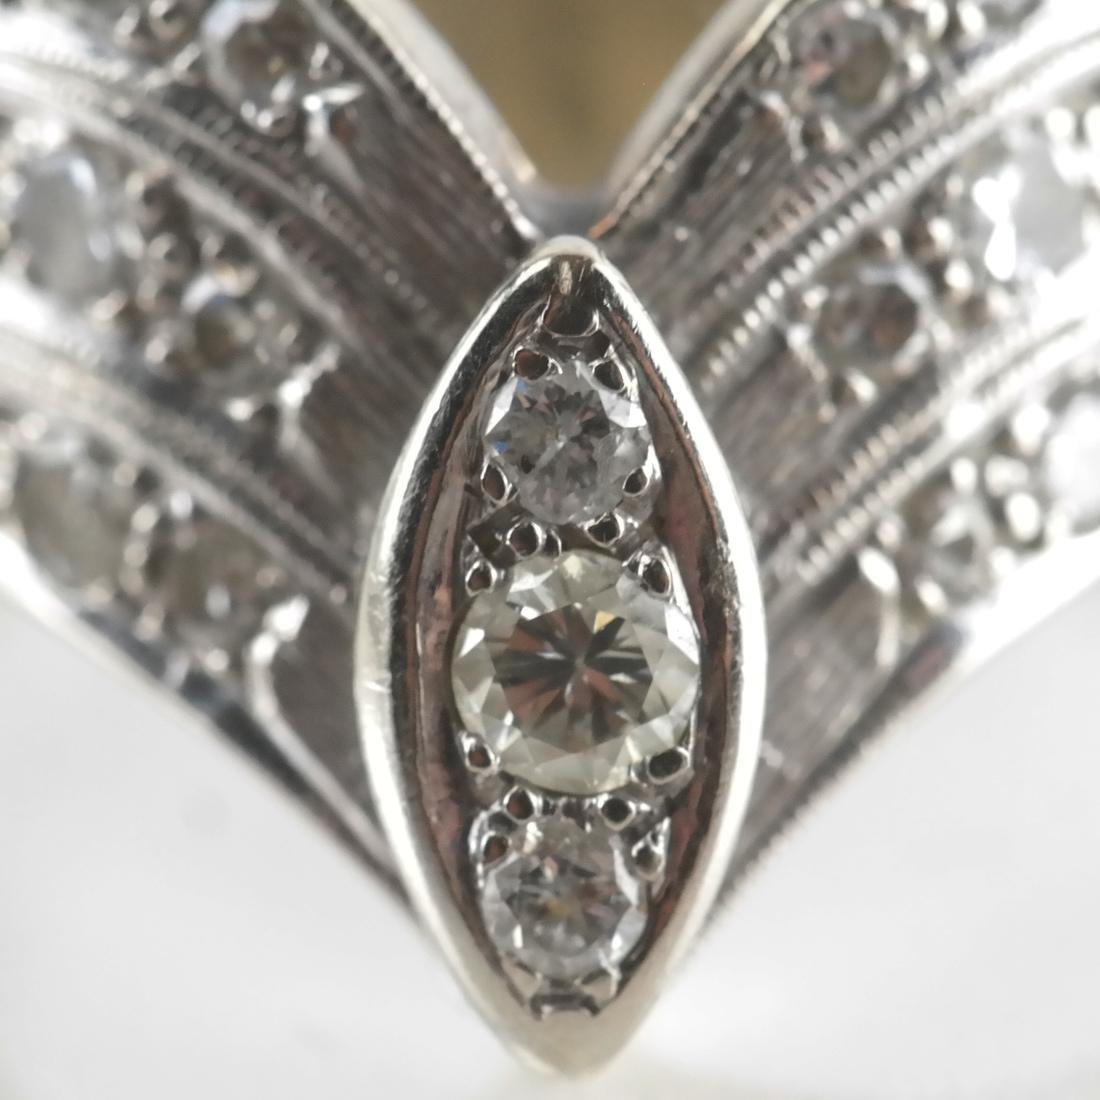 14k WG & Diamond Cocktail Ring - 5